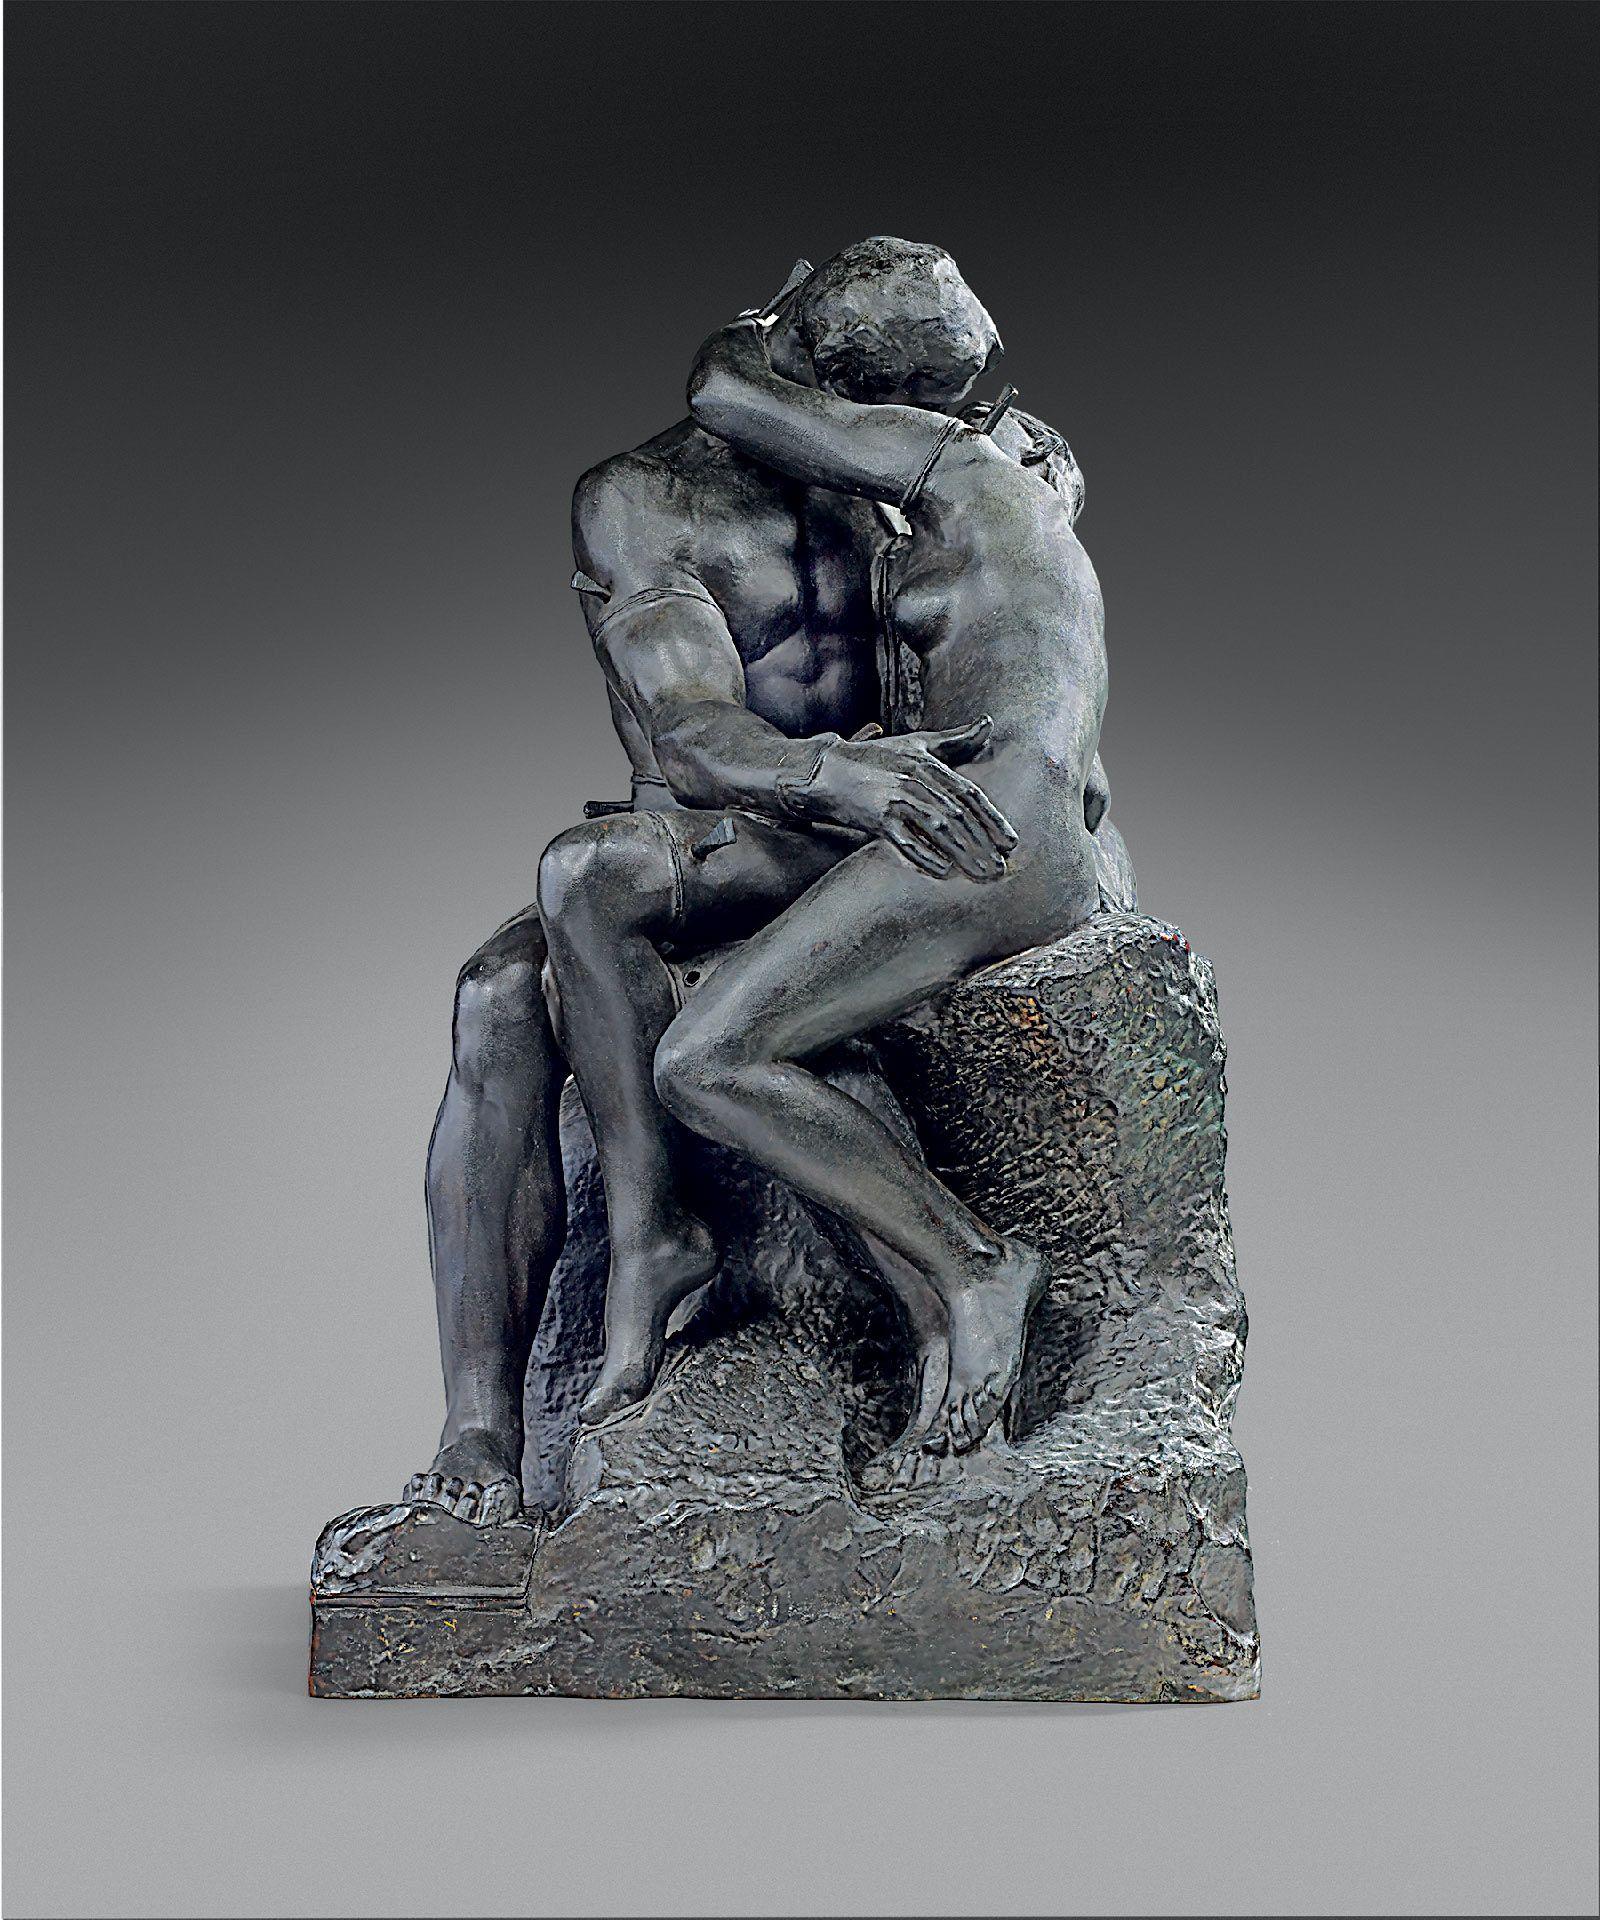 Auguste Rodin, The Kiss, reduction No. 1, master model, 1898, bronze, Barbedienne Foundry, cast 1898, 71.1 x 42.5 x 45 cm. Paris, Musée Rodin. © Musée Rodin (photo Christian Baraja)